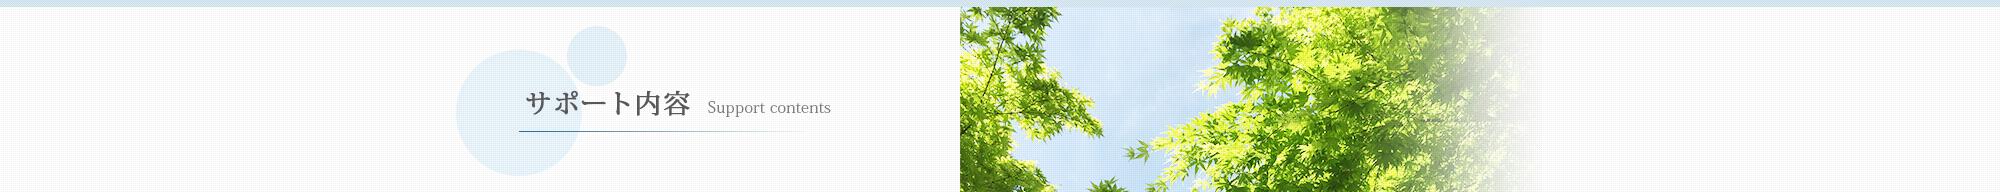 松原陽子の画像 p1_27